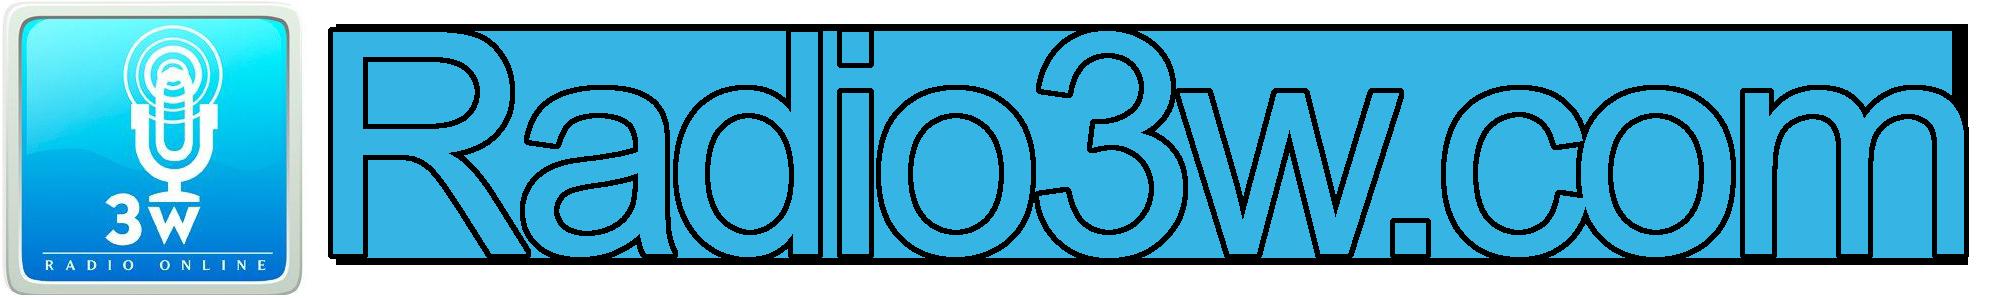 Radio3w.com